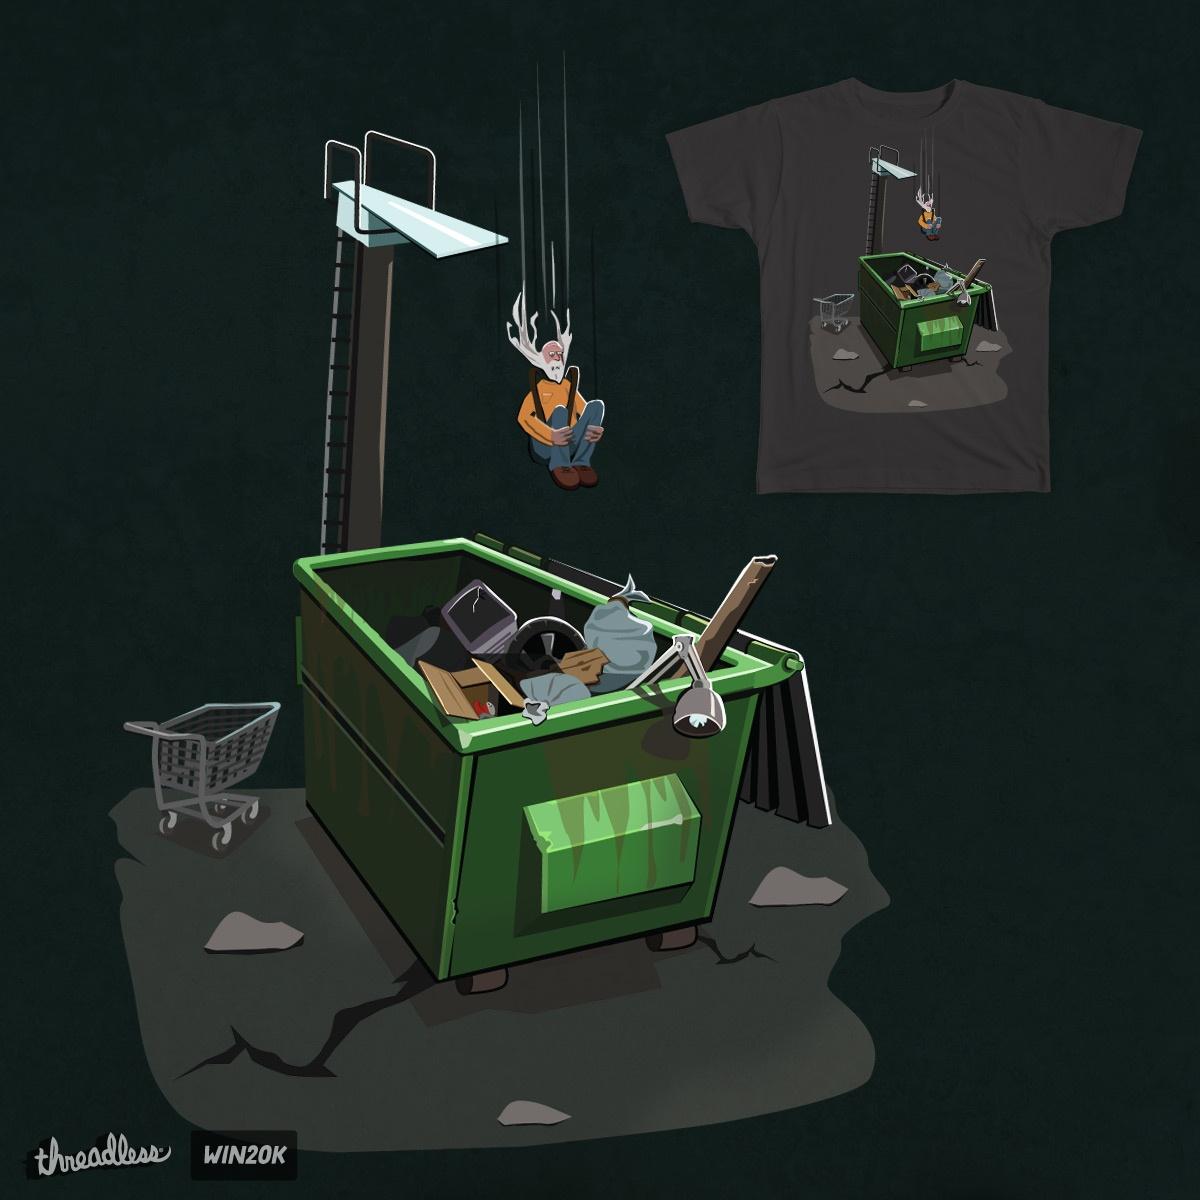 Dumpster Diving V.2 by Sketchulator on Threadless